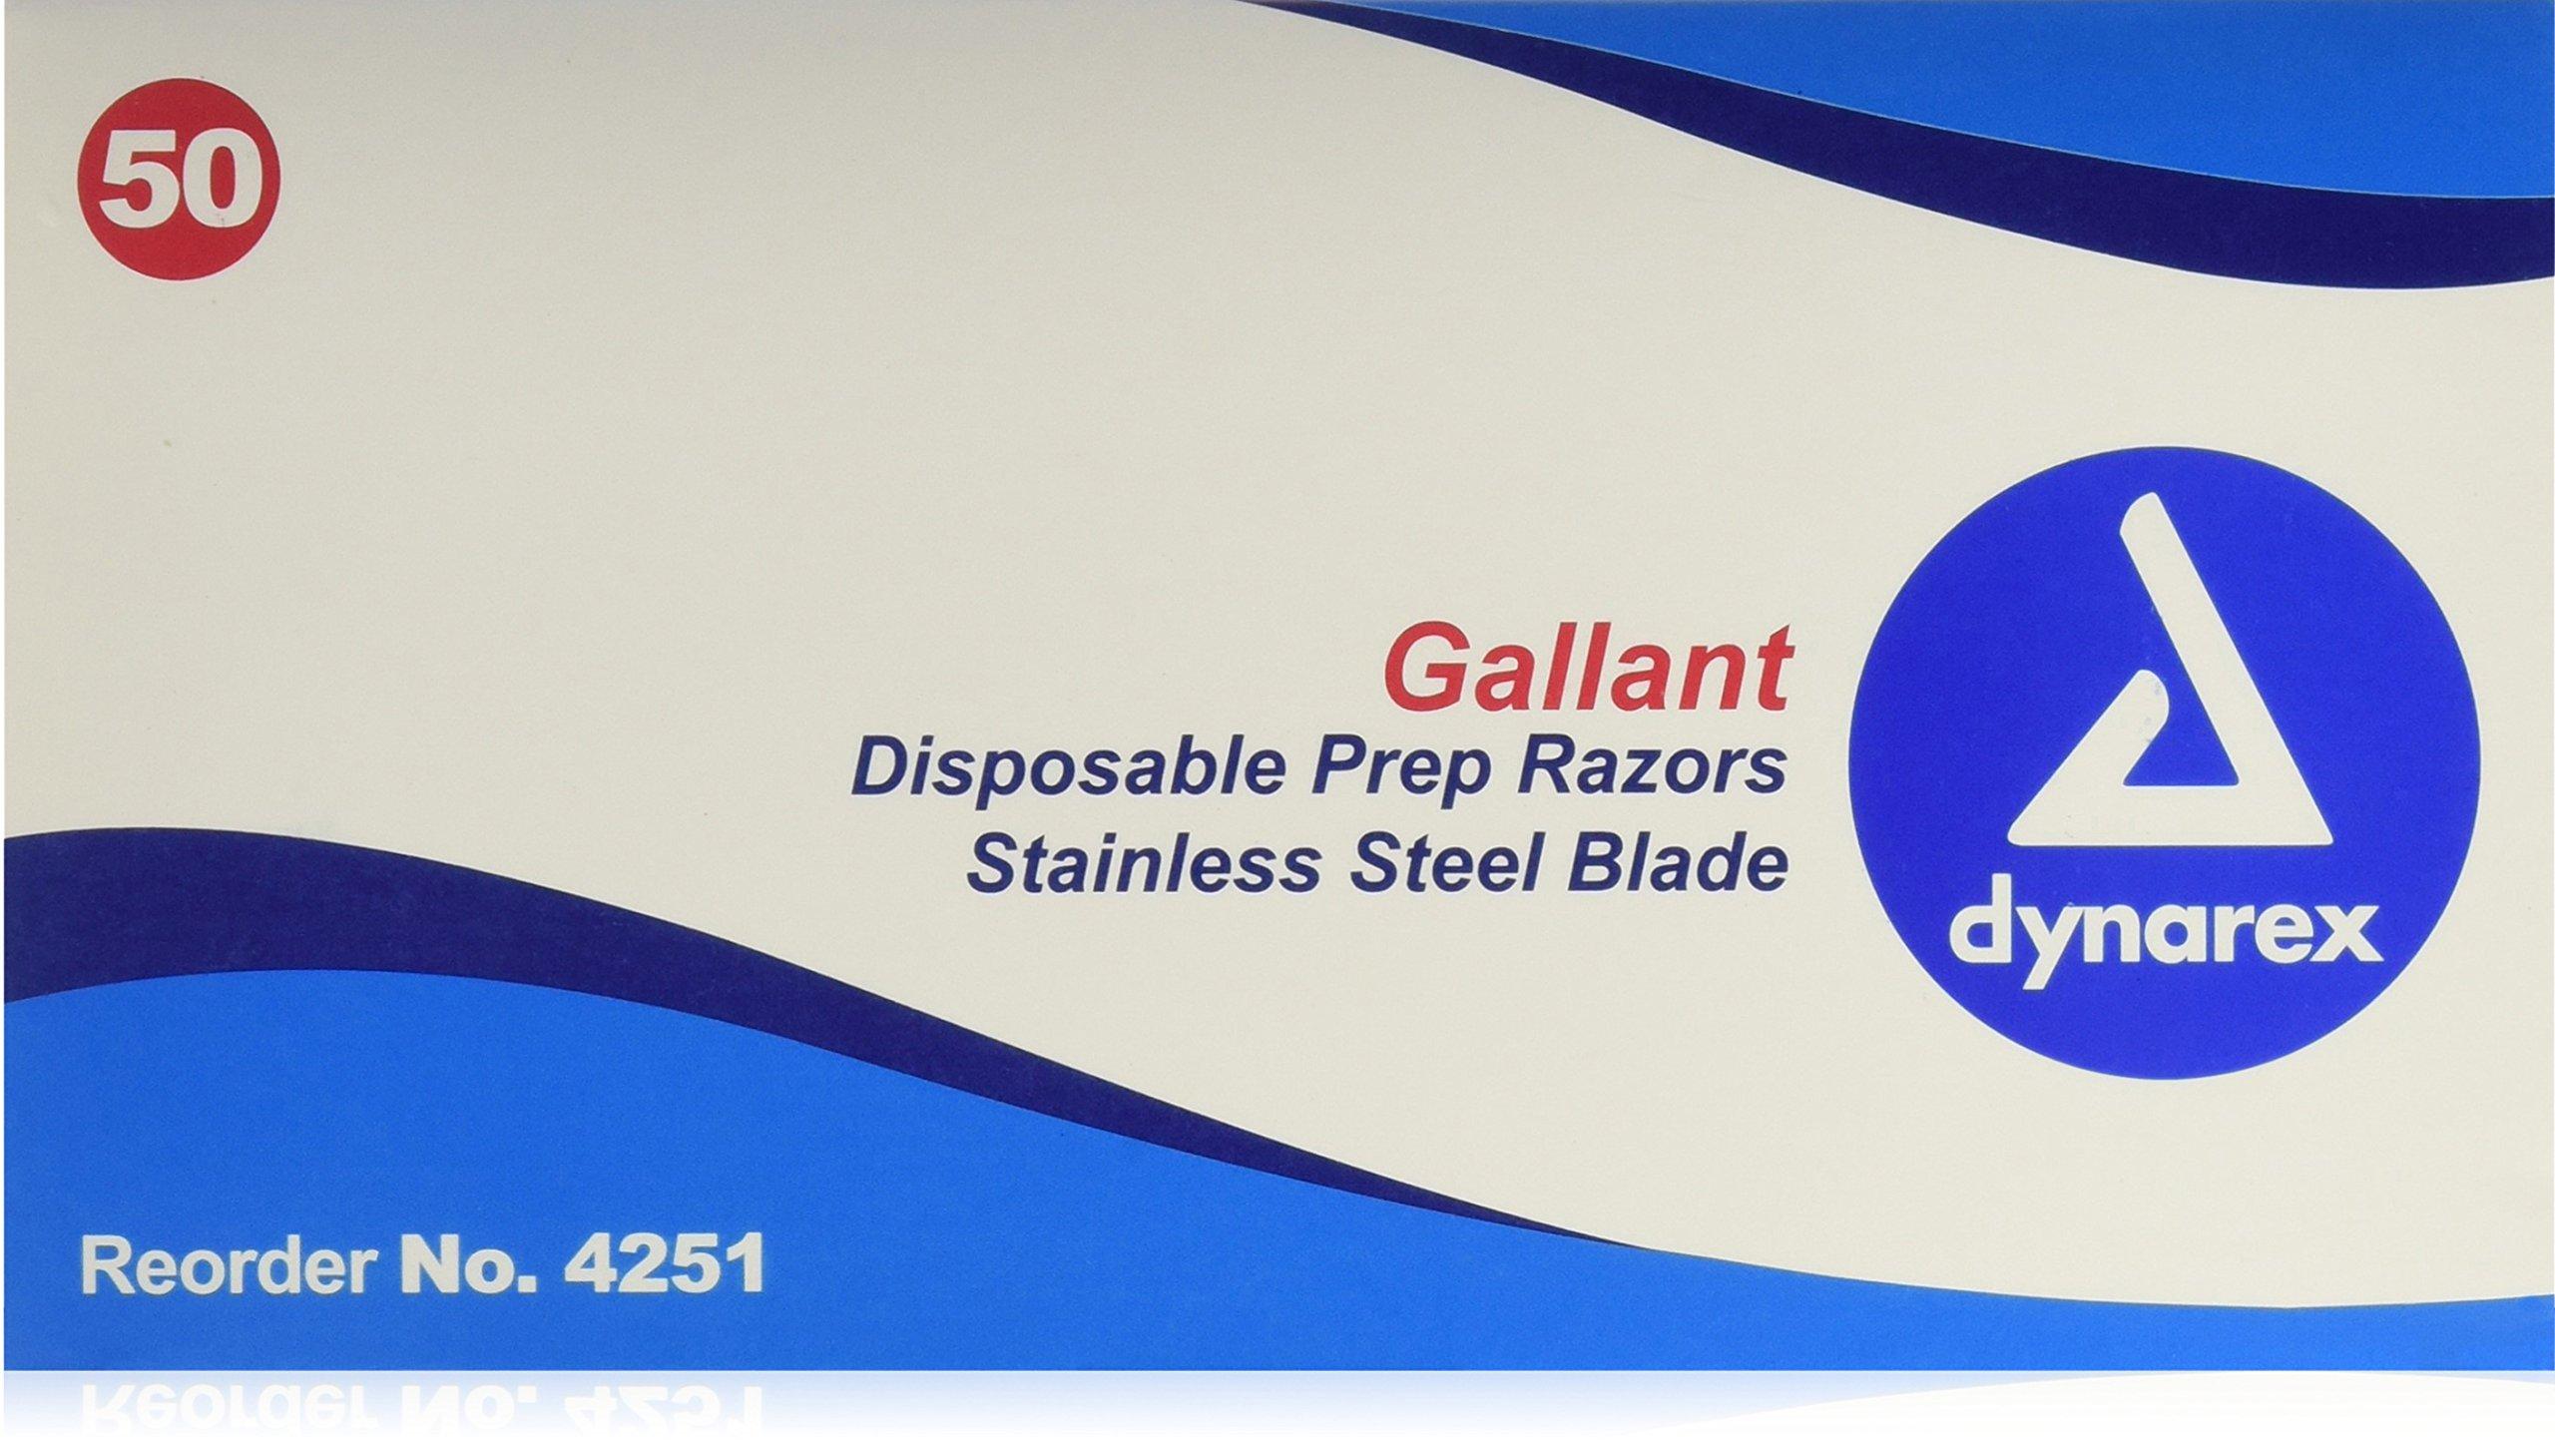 Dynarex Gallant™ Disposable Prep Razors, 5 Count